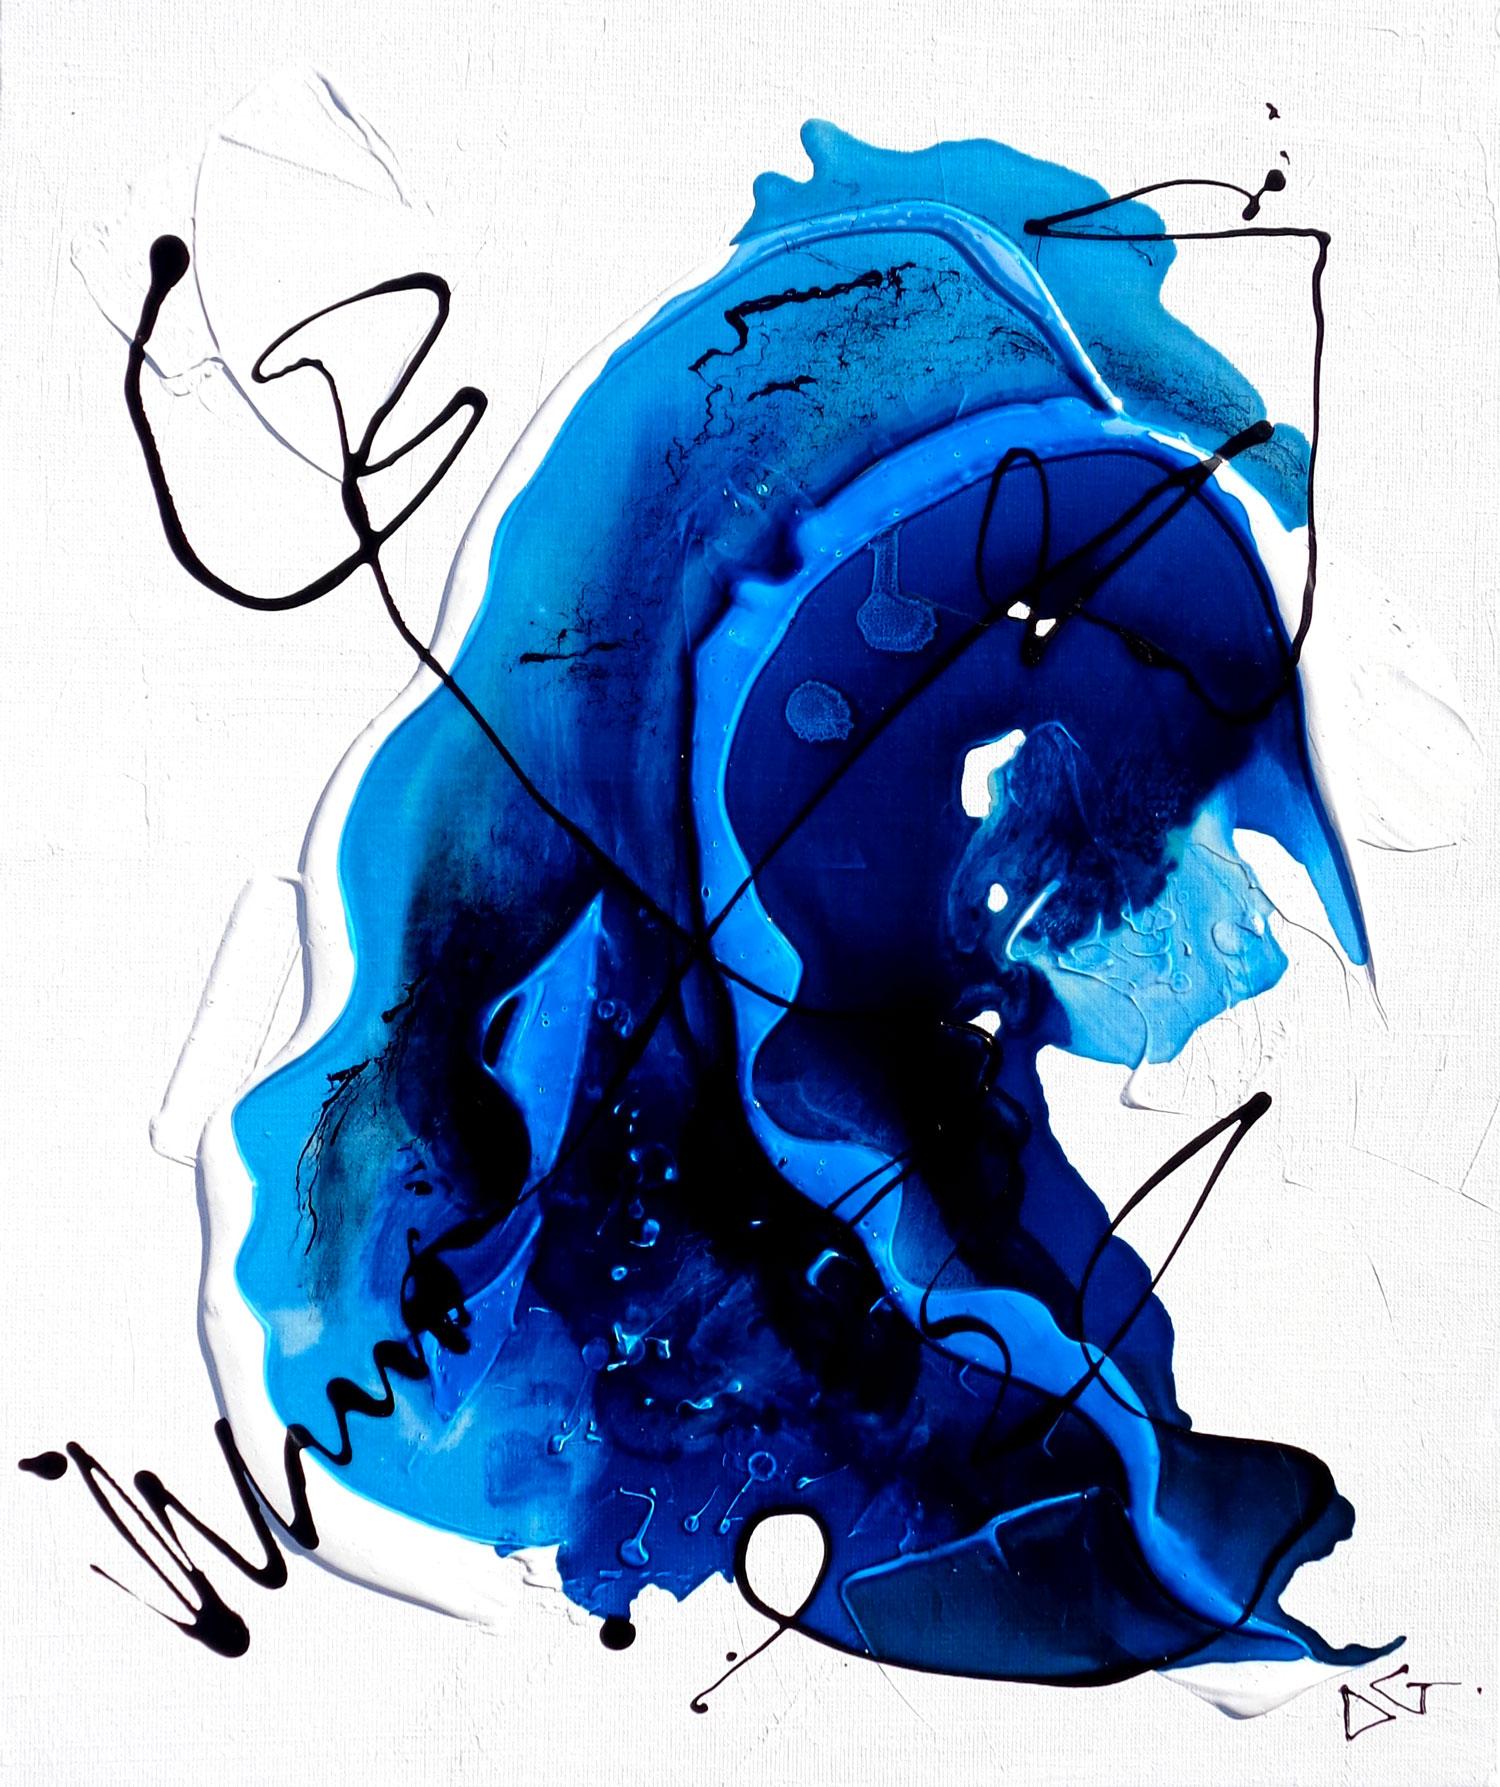 Abysse (David Guillou)